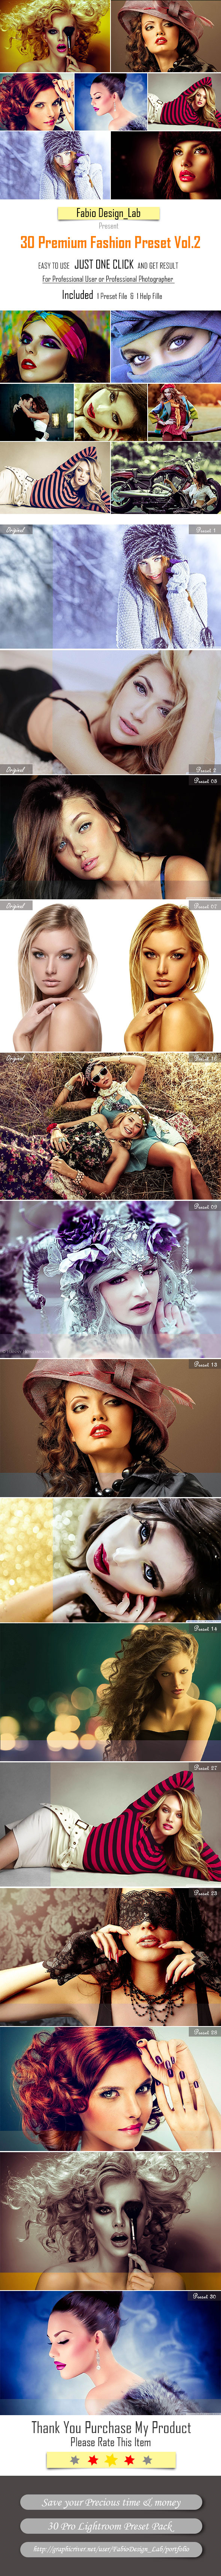 30 Premium Fashion Preset Vol.2 - Portrait Lightroom Presets